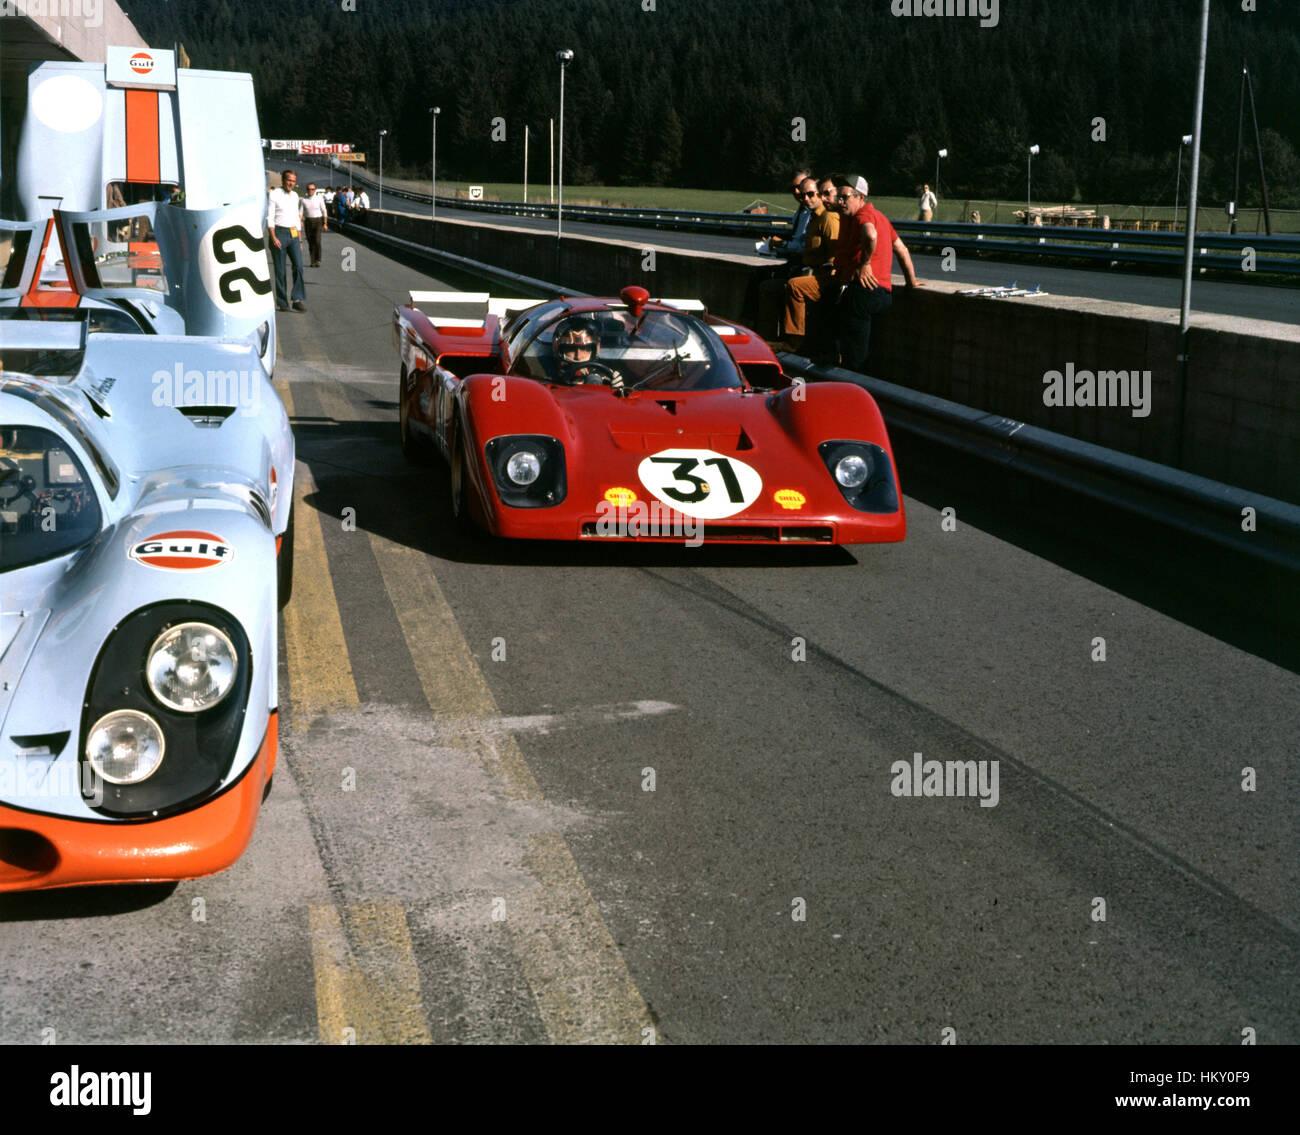 Car Racing Dnf